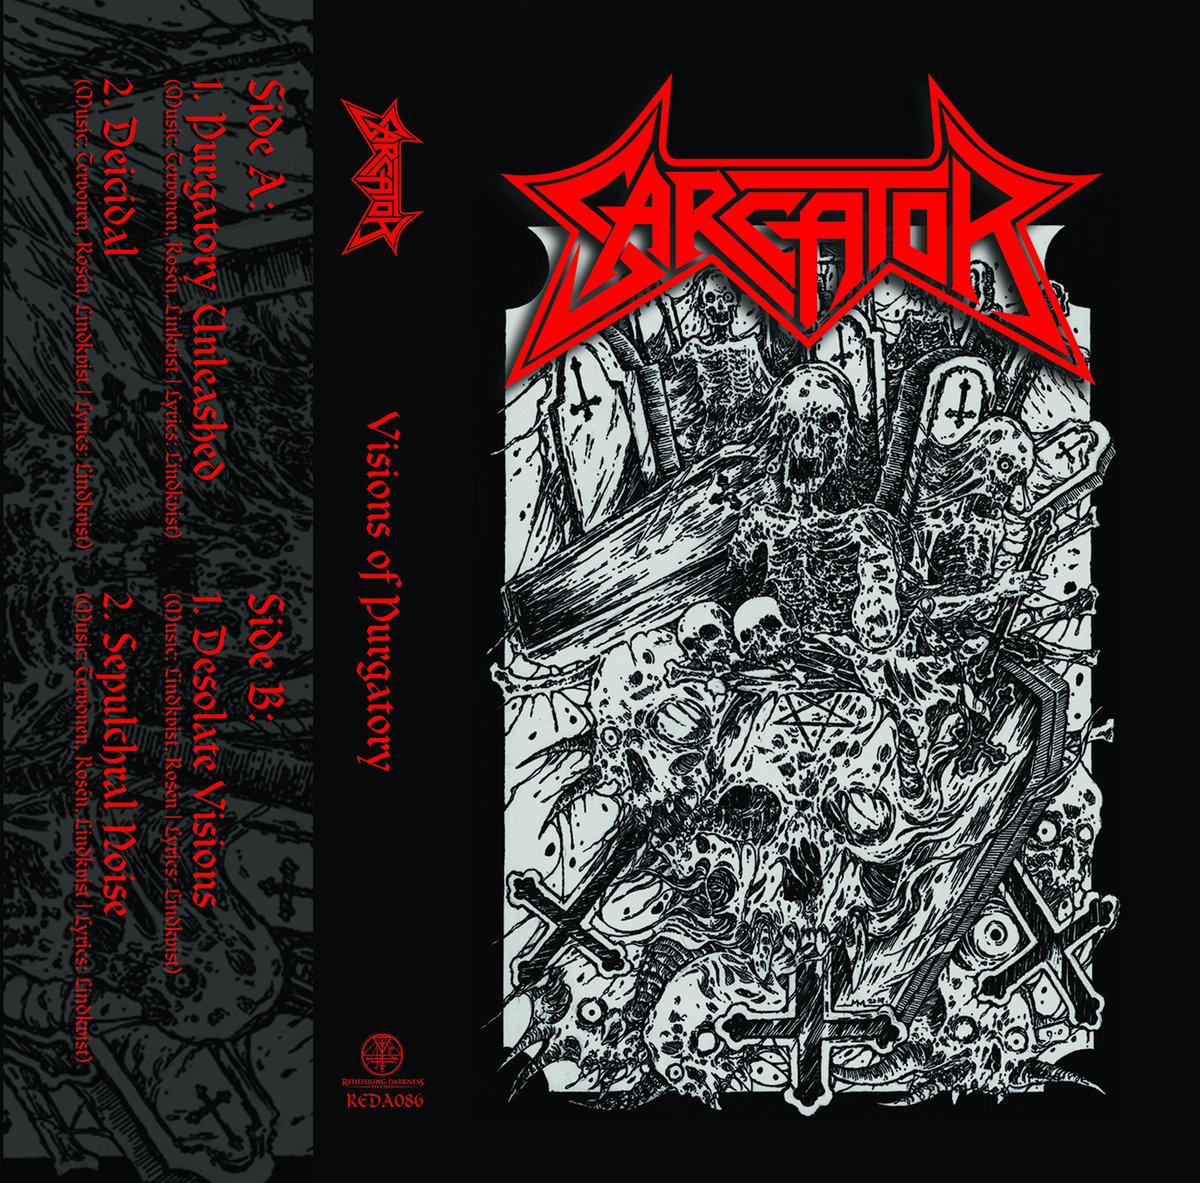 Deicidal from Visions of Purgatory by SARCATOR  https://www.facebook.com/RBGuy9000/posts/128996465509337…  𝕎𝕖 𝕣𝕖𝕒𝕝𝕝𝕪 𝕟𝕖𝕖𝕕 𝕪𝕠𝕦𝕣 𝕙𝕖𝕝𝕡!  𝕝𝕚𝕜𝕖  𝕔𝕠𝕞𝕞𝕖𝕟𝕥  𝕤𝕙𝕒𝕣𝕖  #music #metalmusic #metal #follow #techdeath #song #radio #deathmetal #bandcamp #heavymetal #thrashmetal #bandpic.twitter.com/QvfVorPH5l